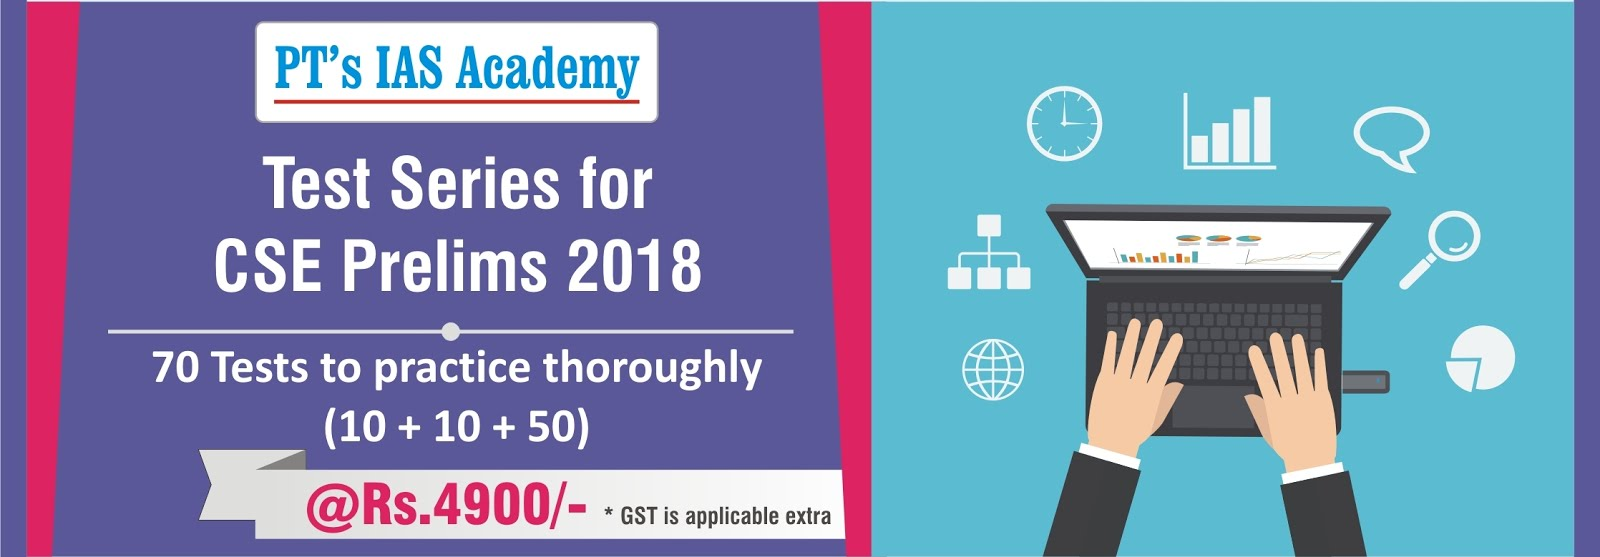 Test Series for CSE Prelims 2018